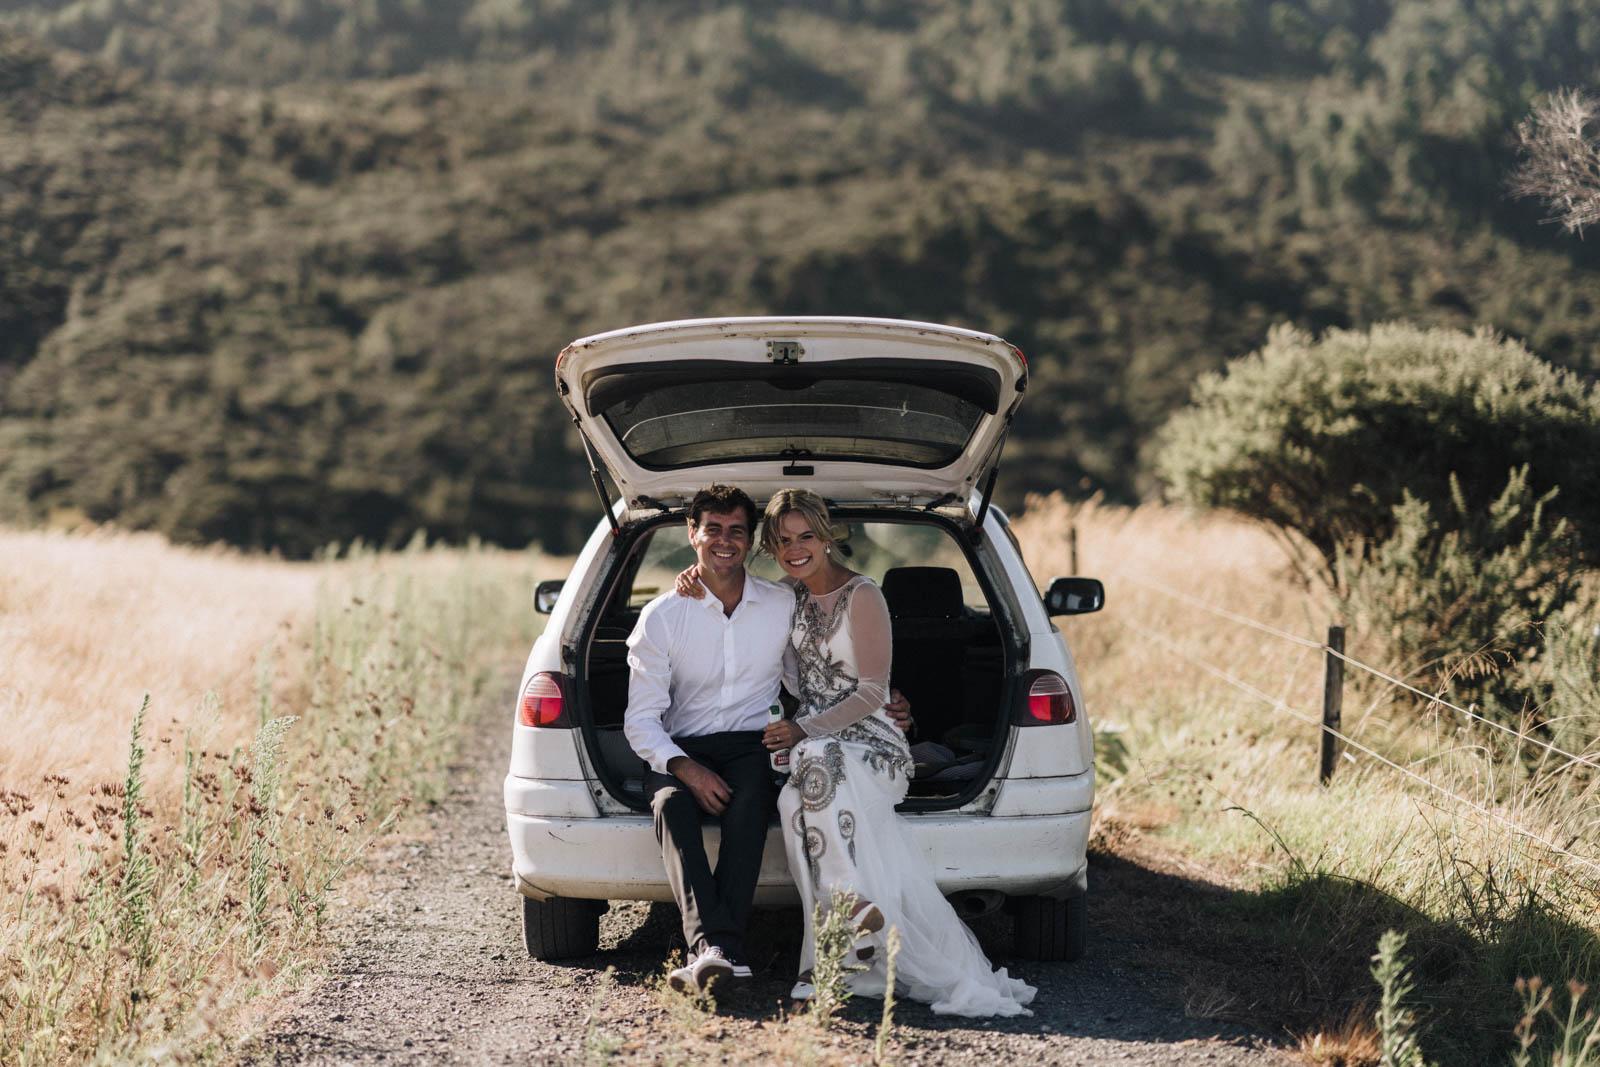 newfound-l-i-coromandel-wedding-photographer-1759-A9_04010